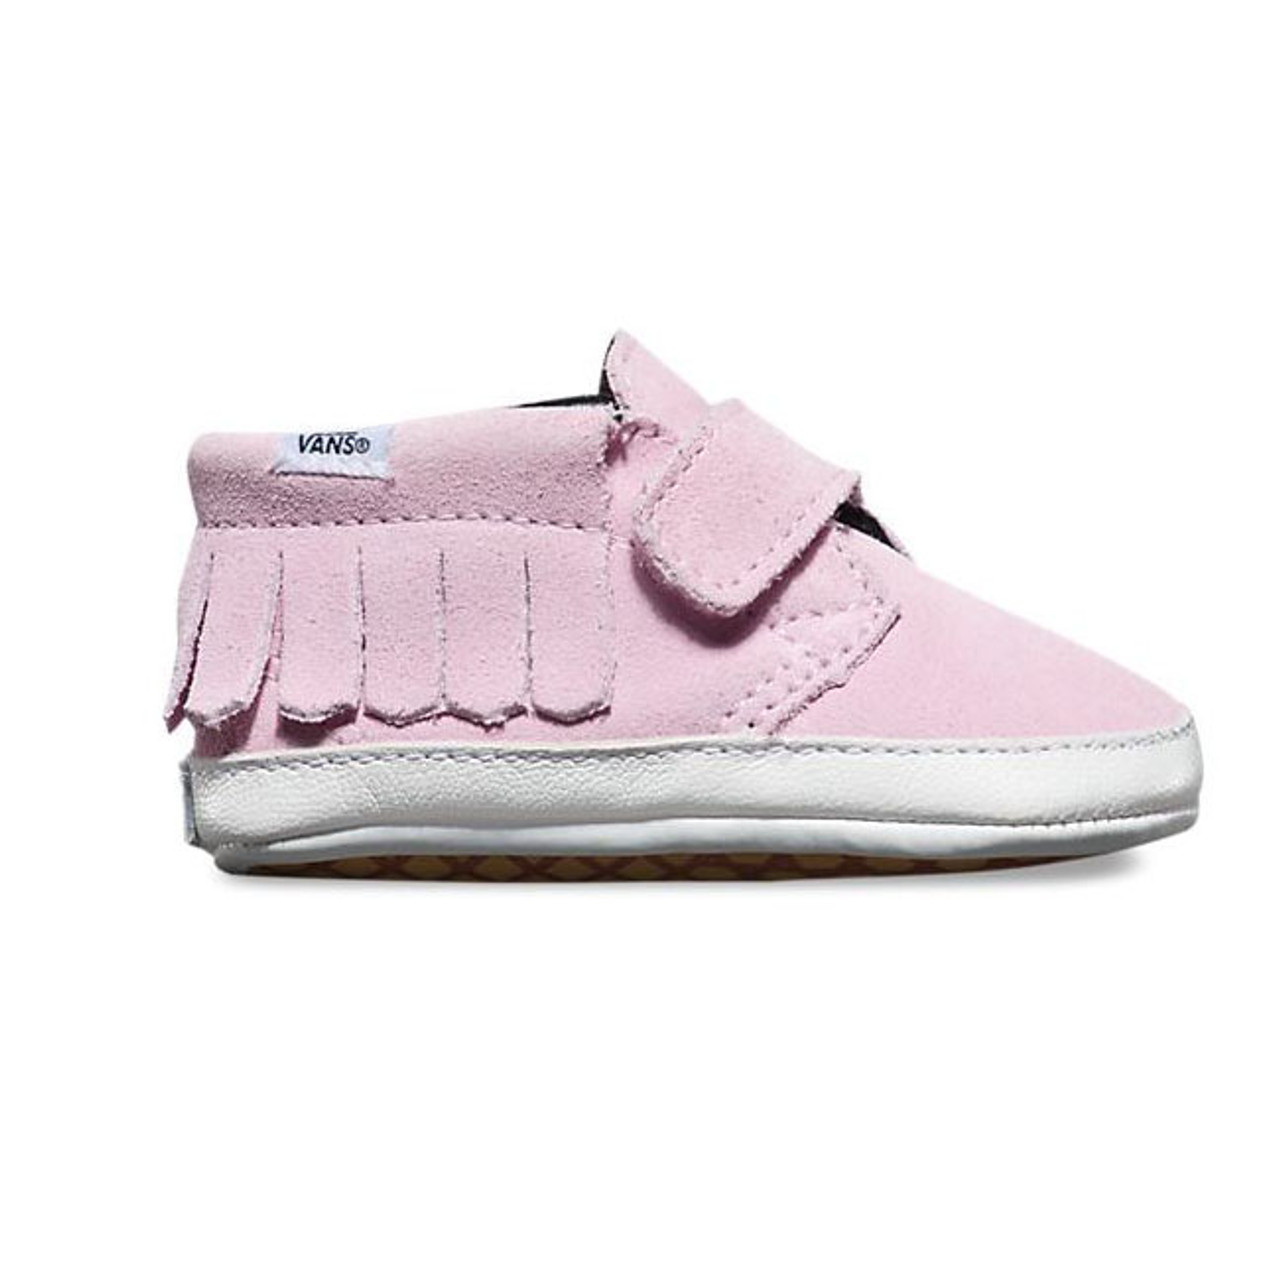 76b1b5793b8 Vans Baby Infant Suede Chukka V Moc Mist Pink Shoes